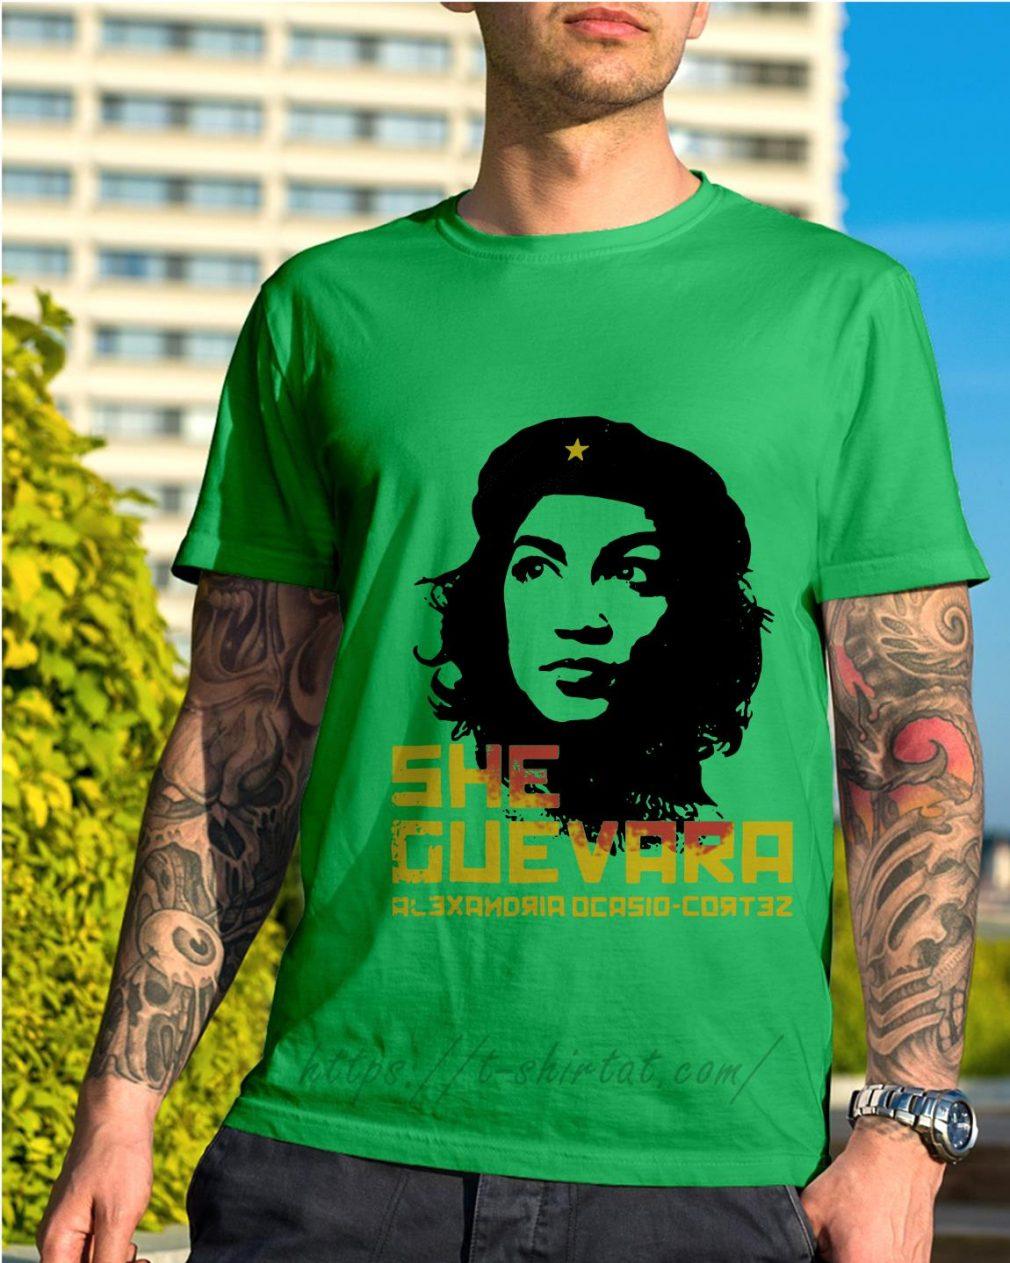 She Guevara Alexandria Ocasio Cortez shirt